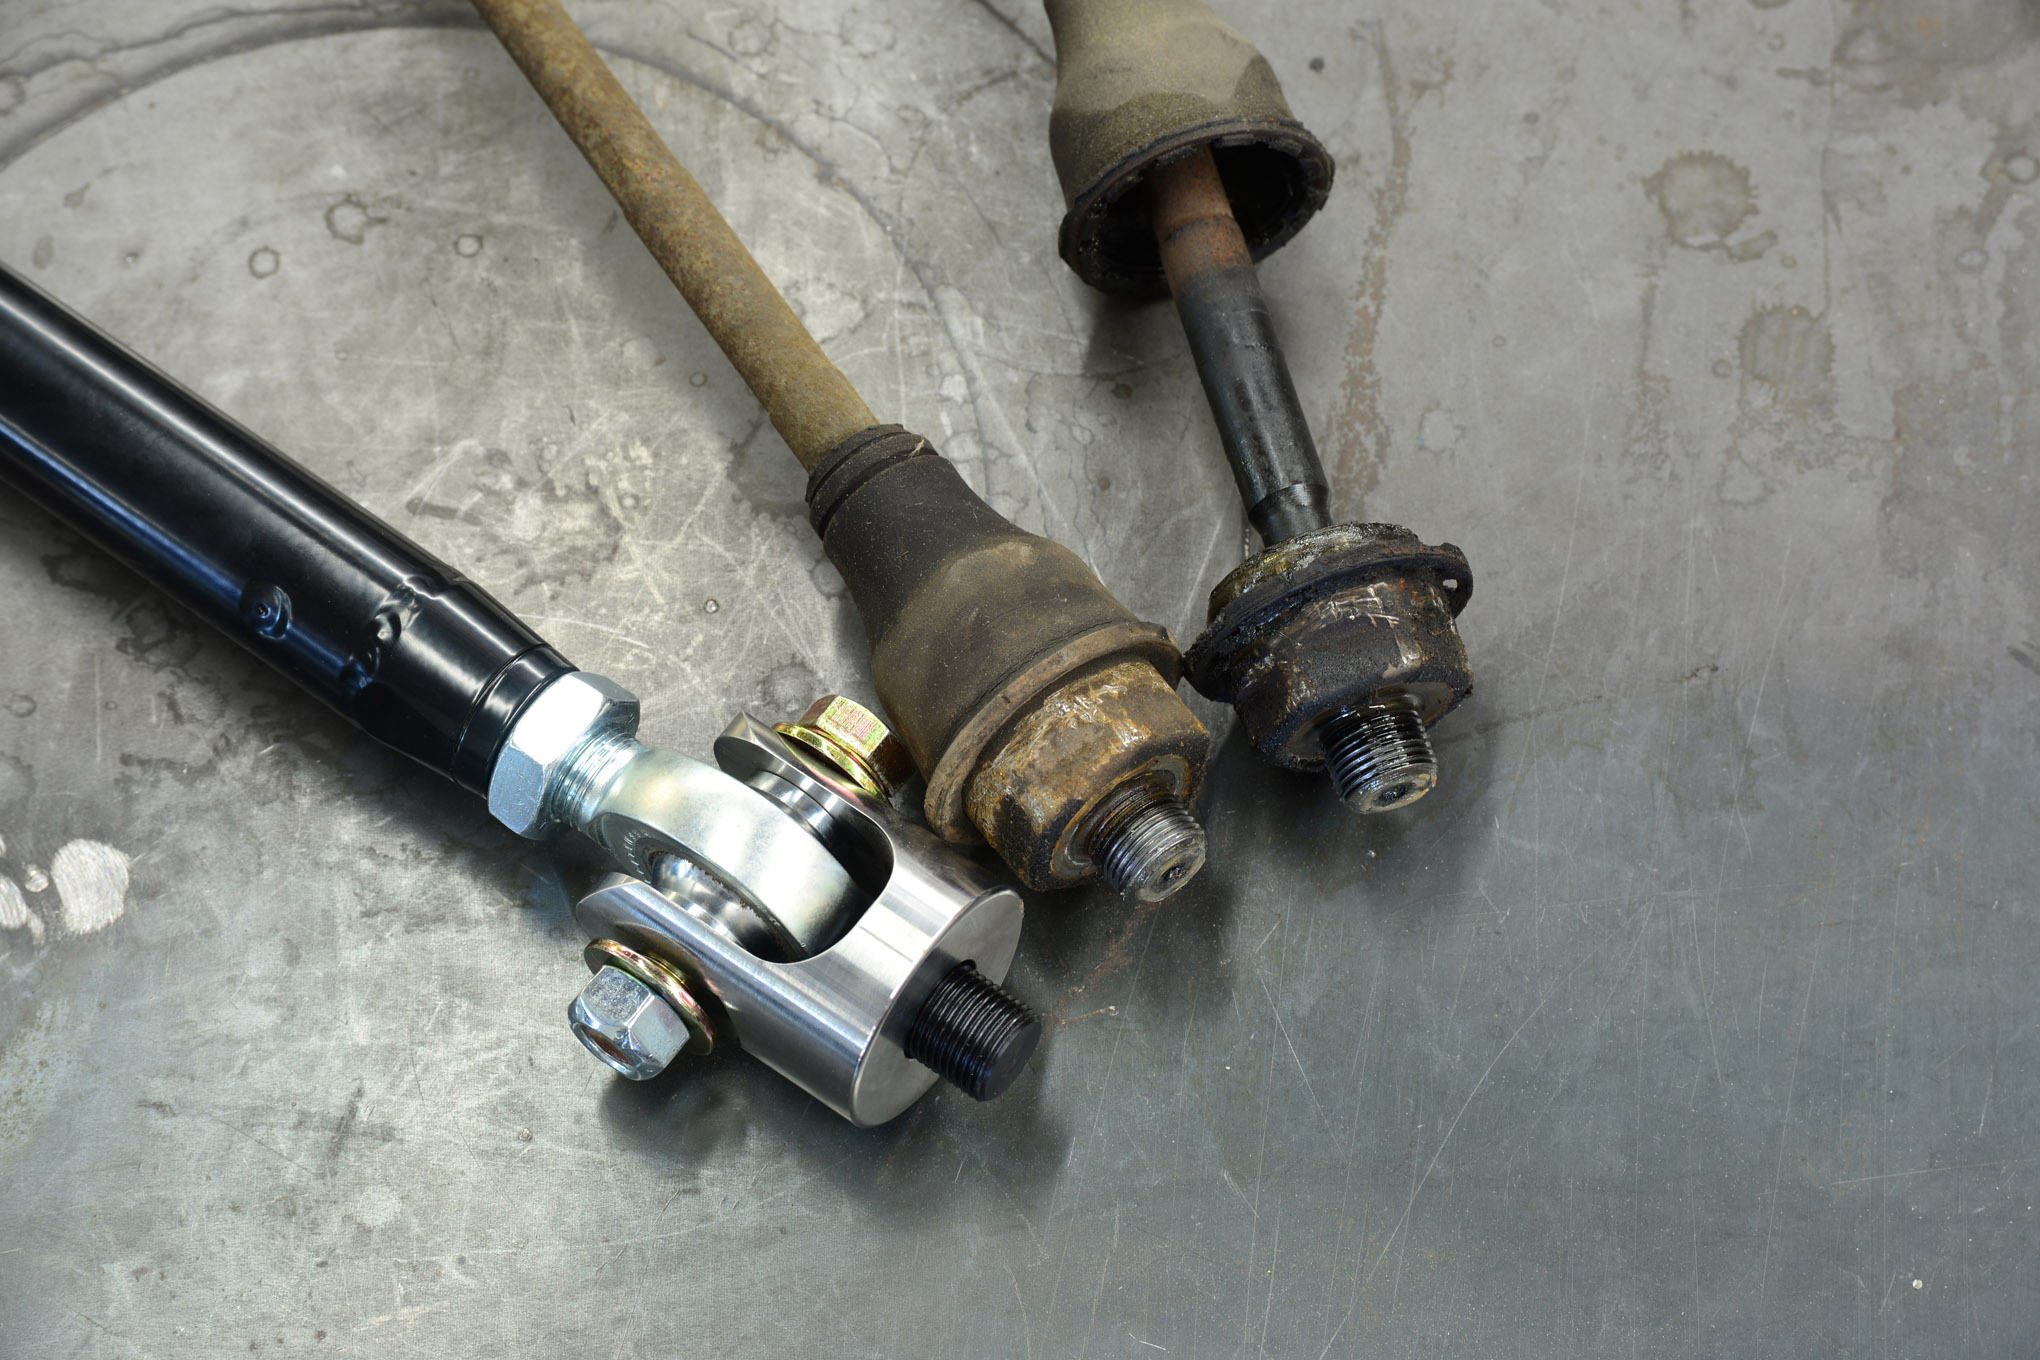 004 techline gm hummer h3 ifs 4x4 hd heavy duty tie rods broken bent replacement jd fabrication